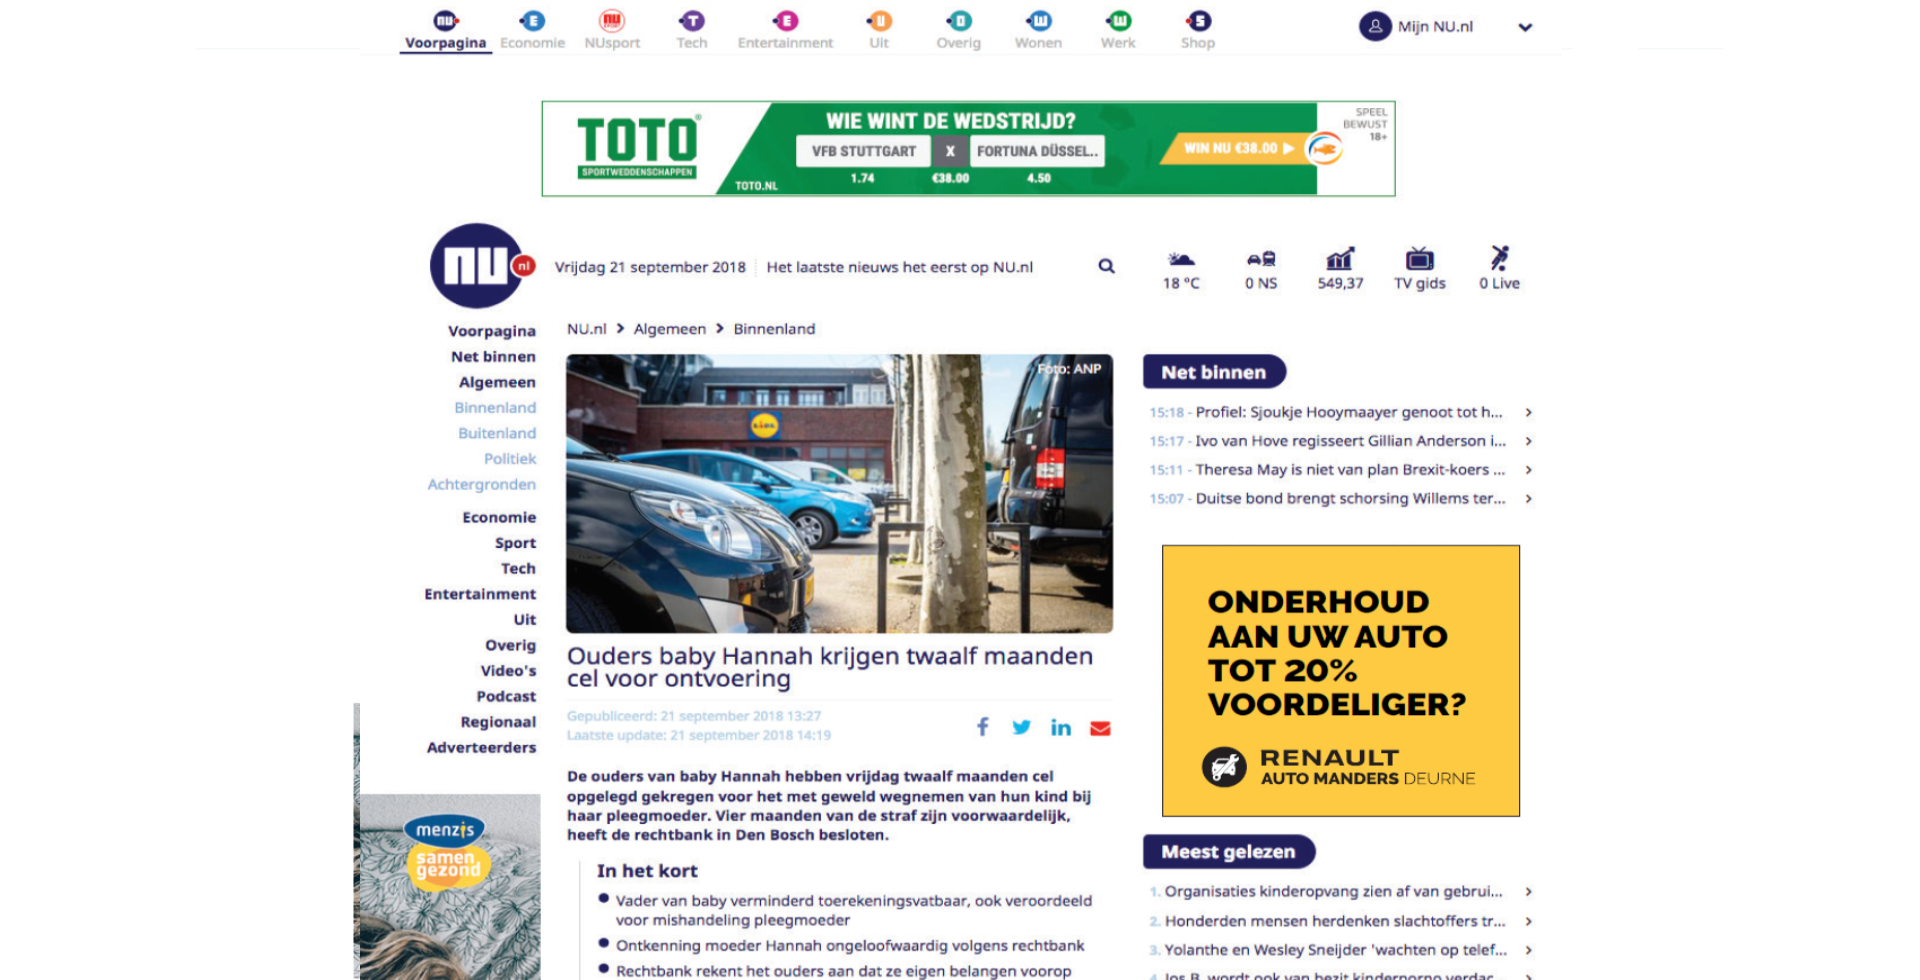 online-advertentie-NU.nl-Spiegel-crossmedia-communicatie